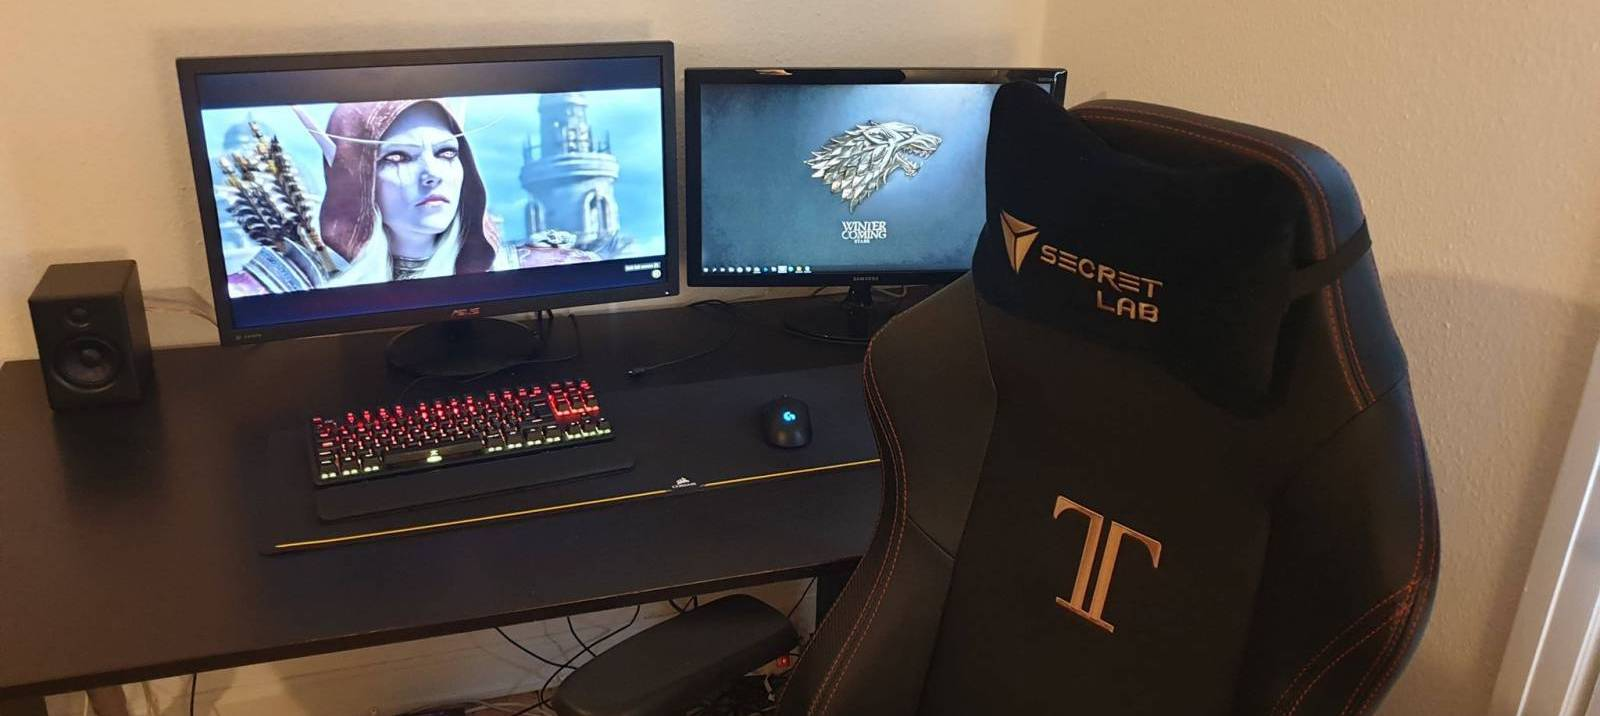 Image of gaming setup with titan chair